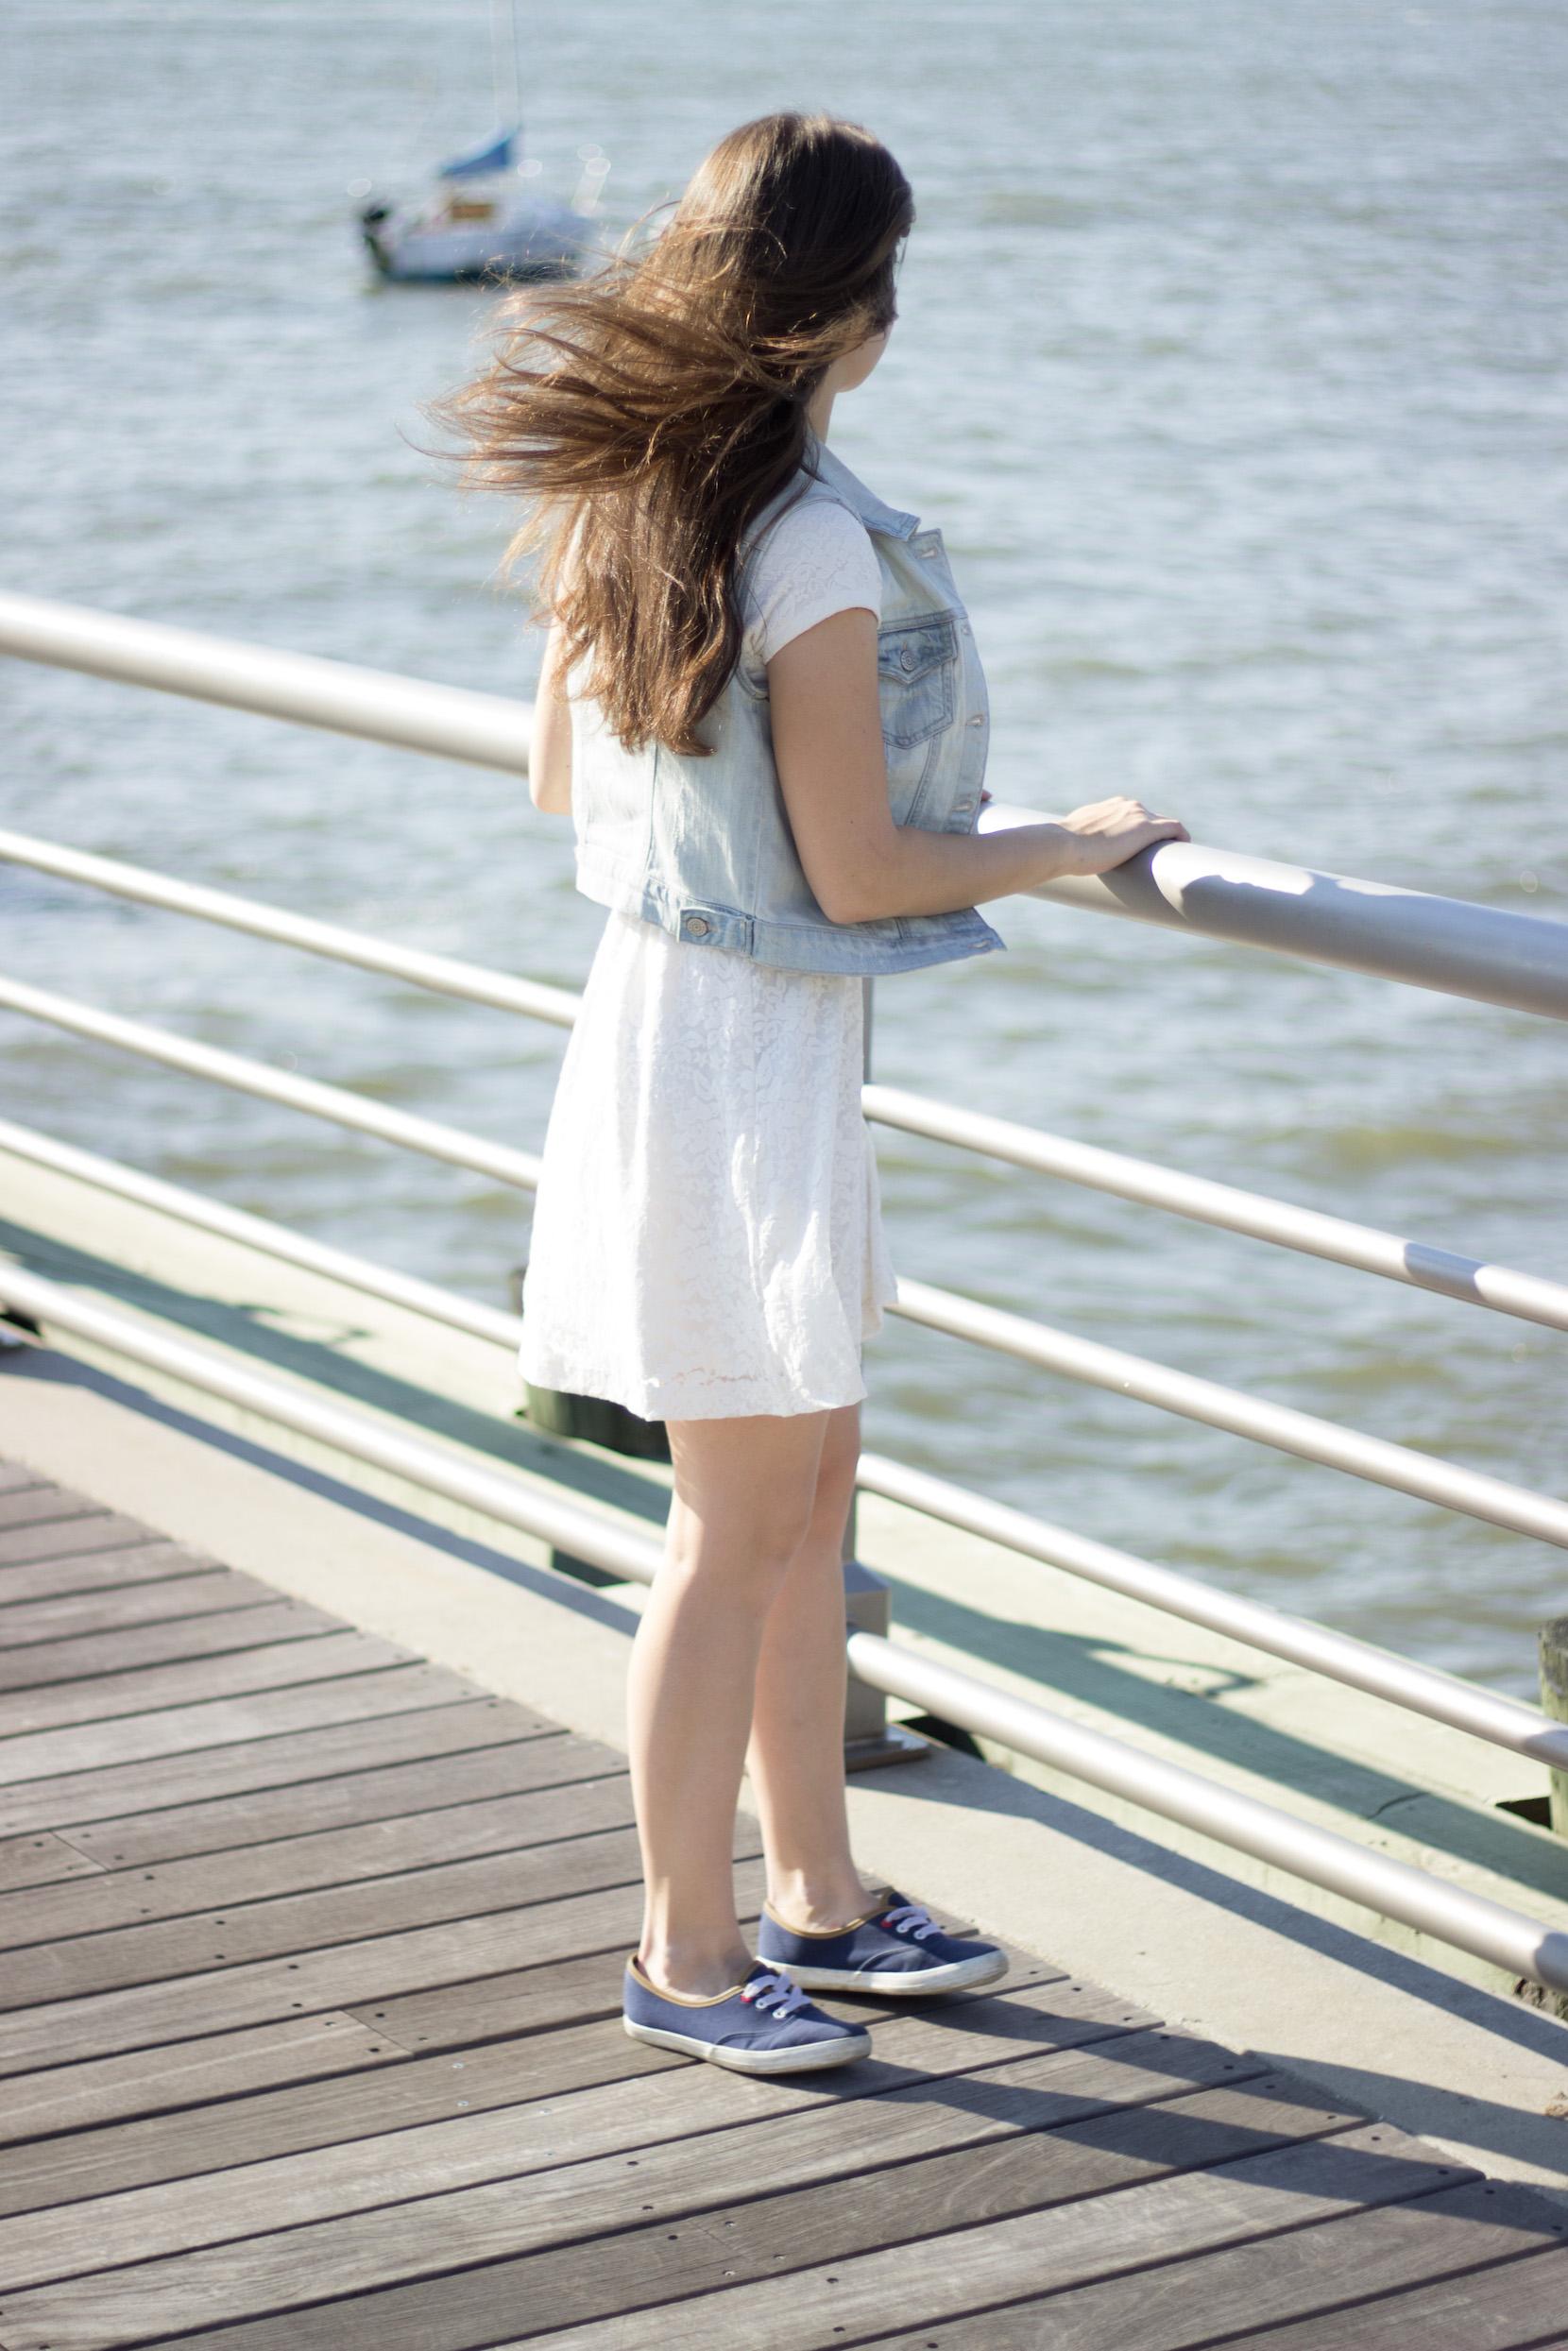 katya wind hudson denim white dress irra korrelat walksmilesnap new york senior photo sun.jpg